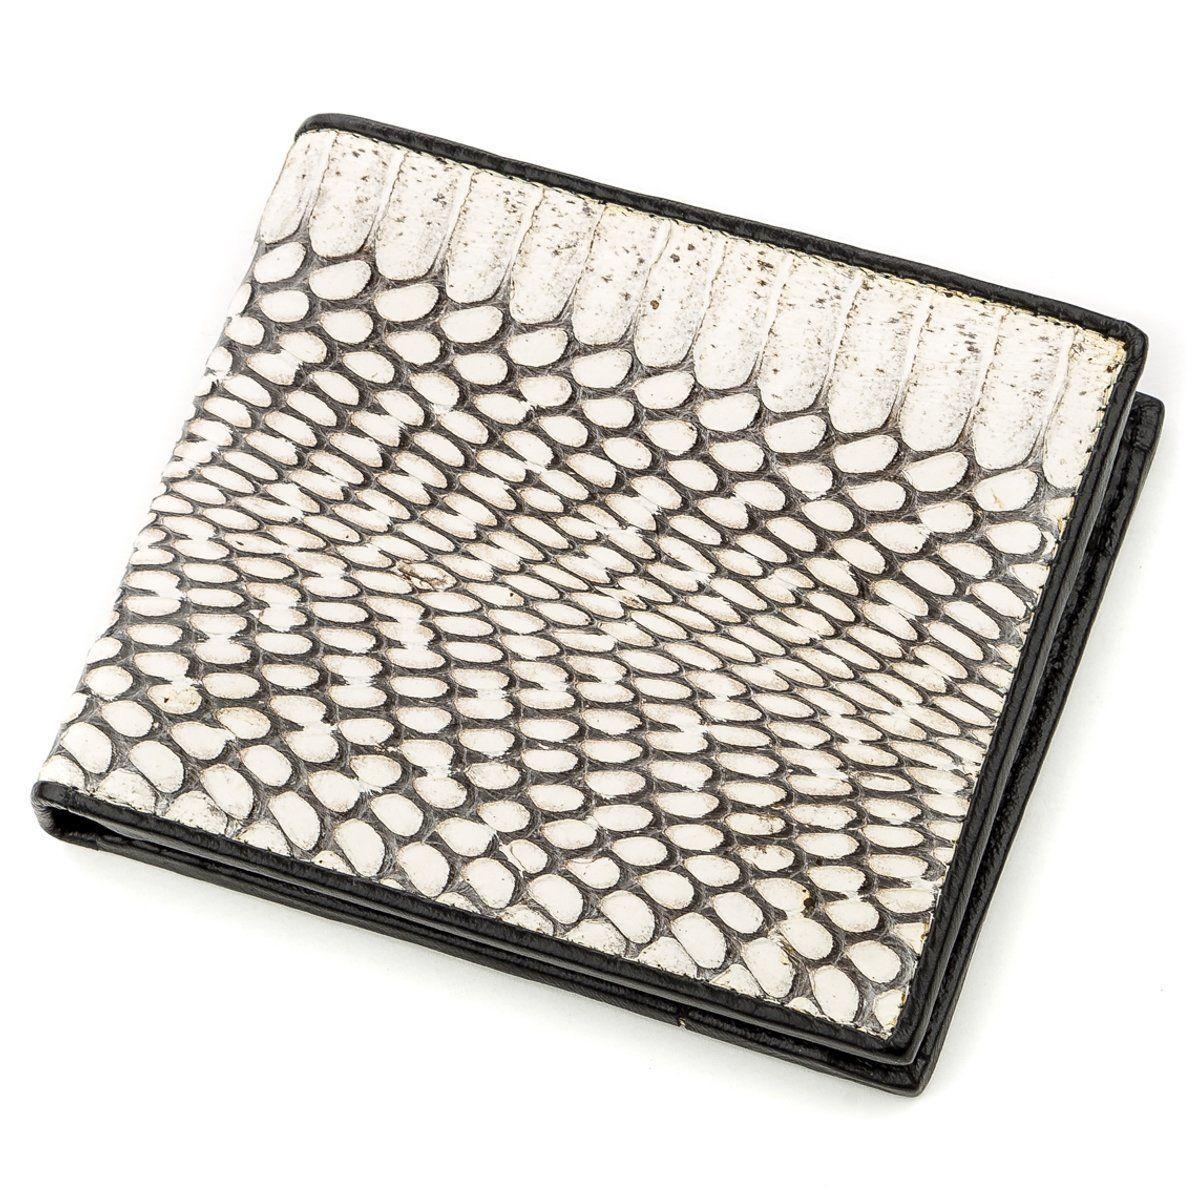 Бумажник мужской SEA SNAKE LEATHER 18552 из натуральной кожи кобры Серый, Серый